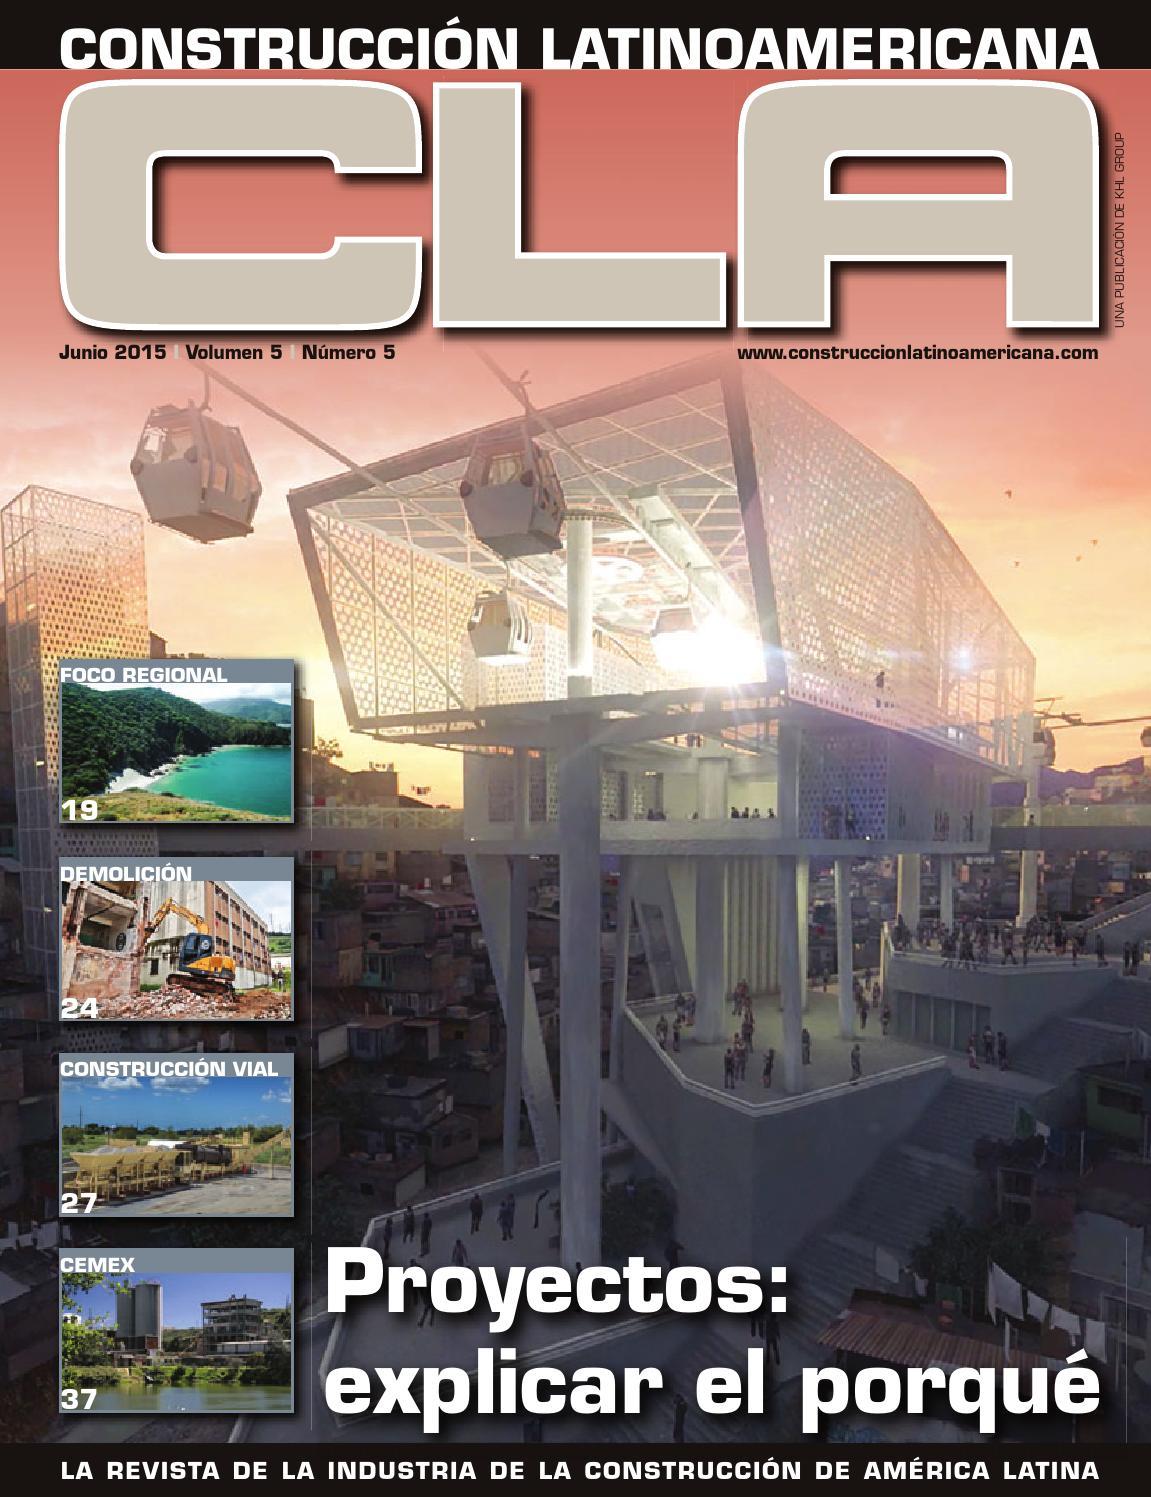 Construcción Latinoamericana Junio 2015 by Raul M. E. - issuu